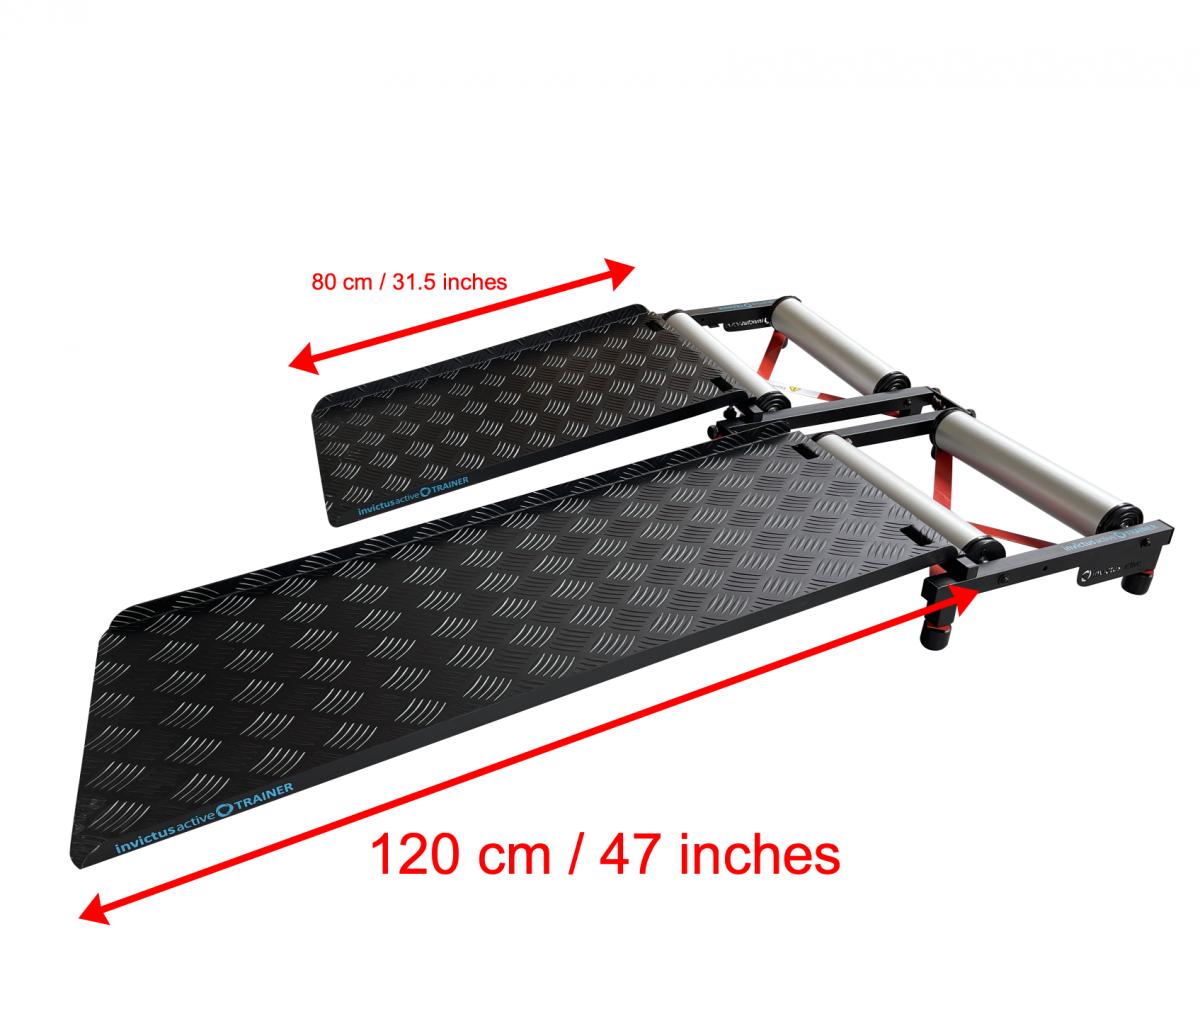 120 cm longer ramps